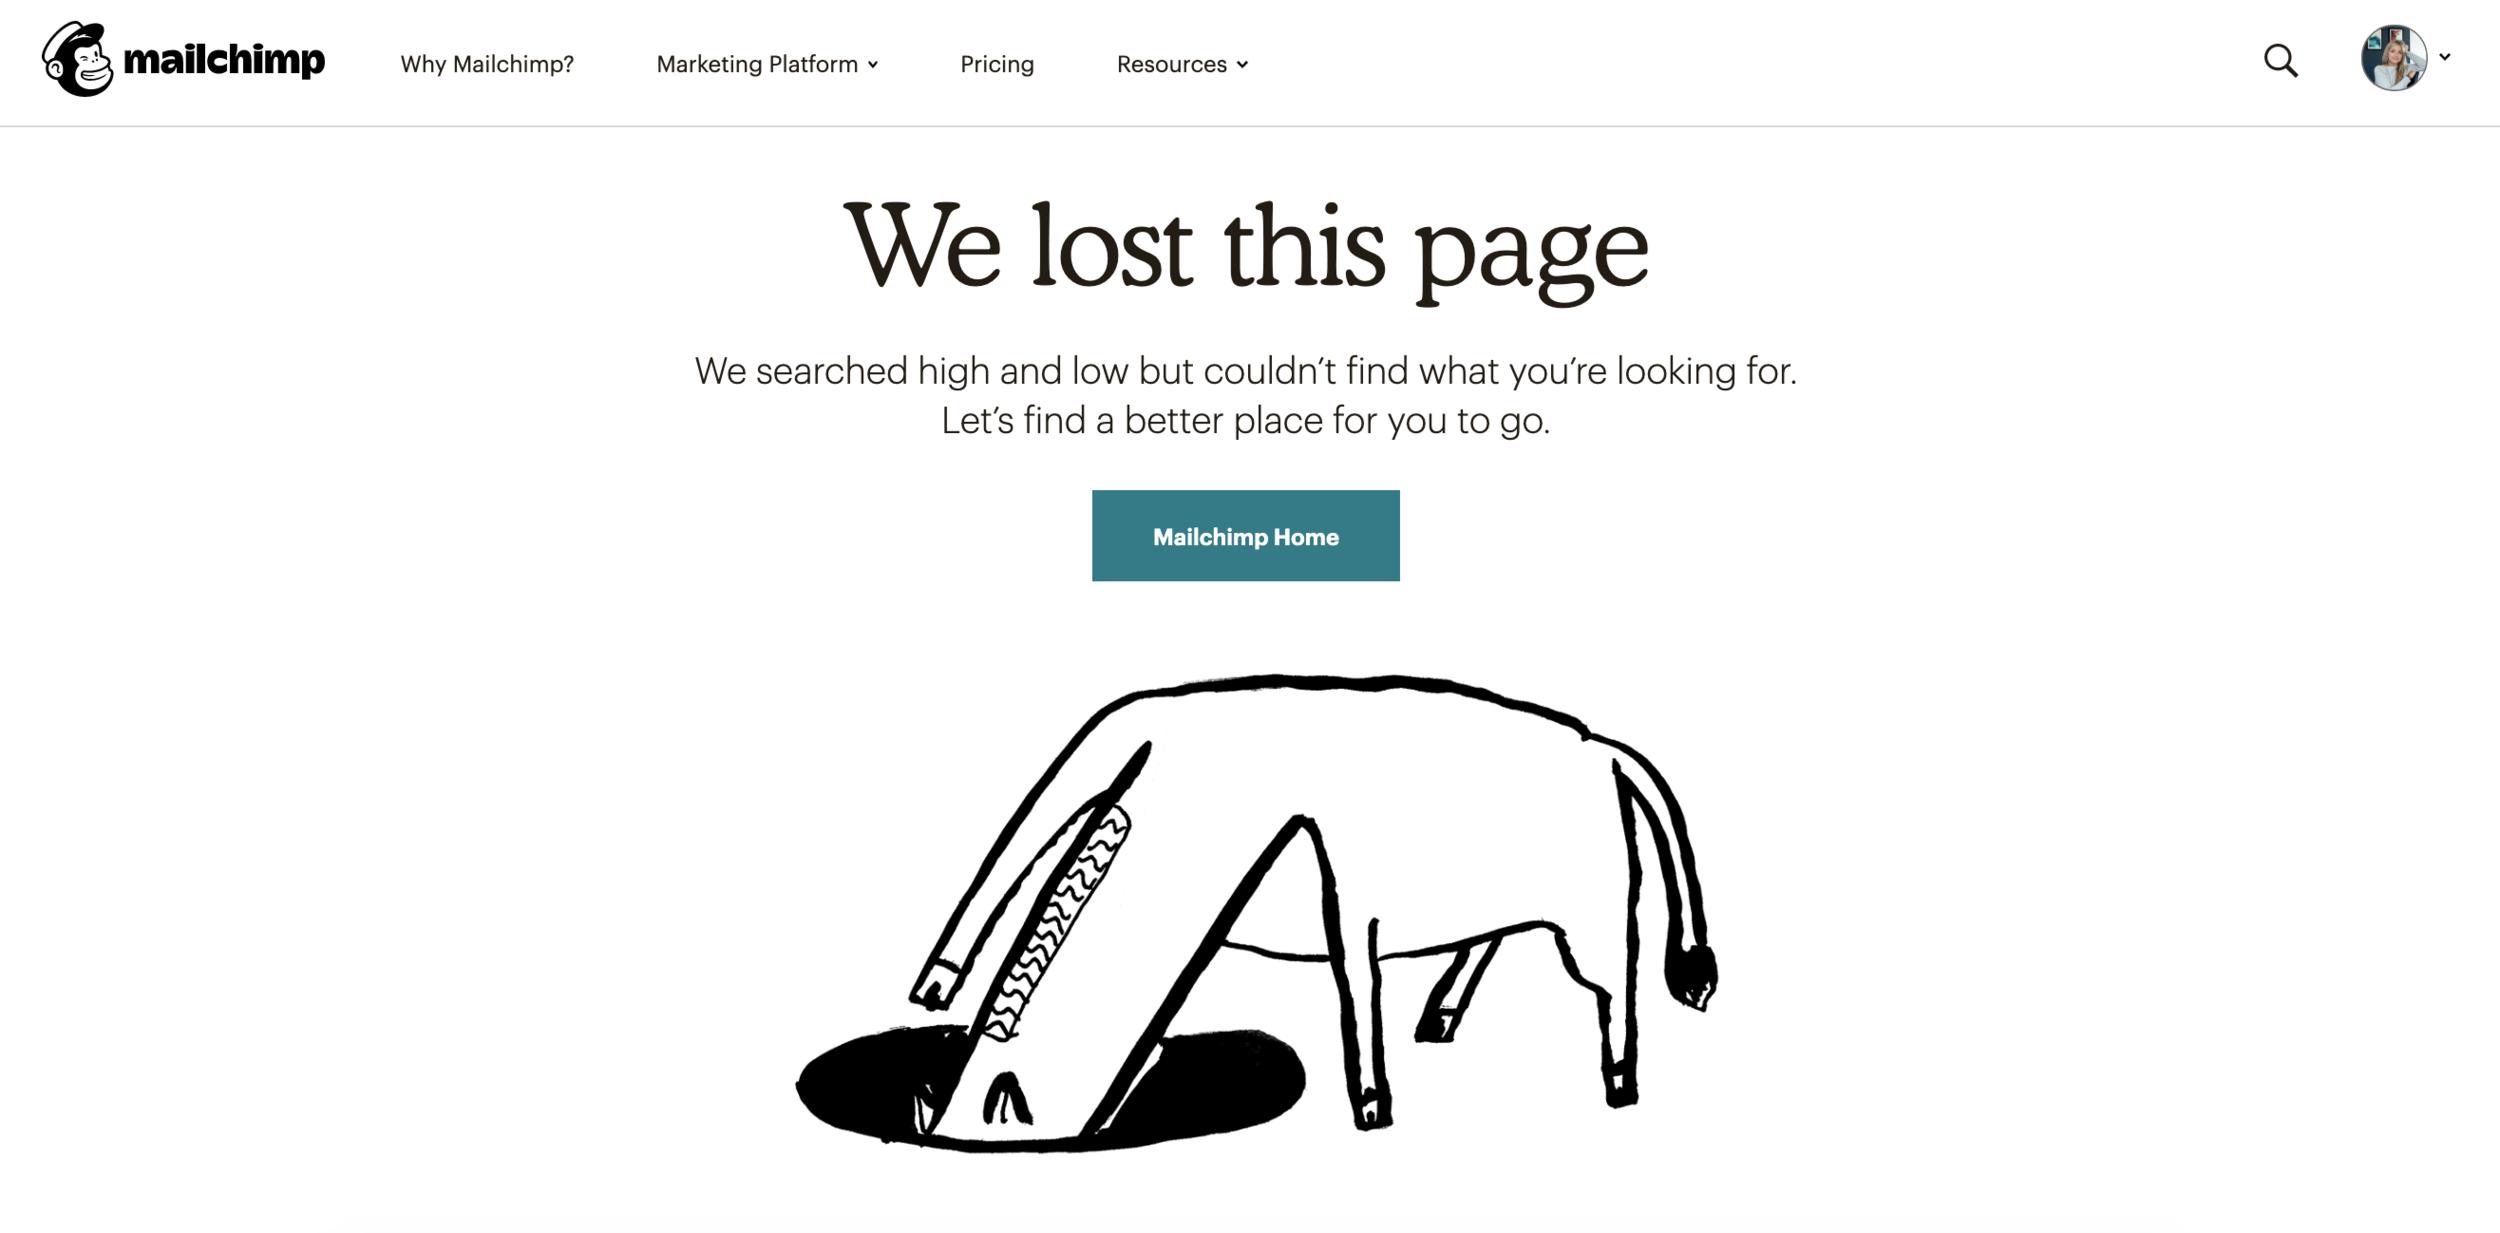 Mailchimp's 404 page